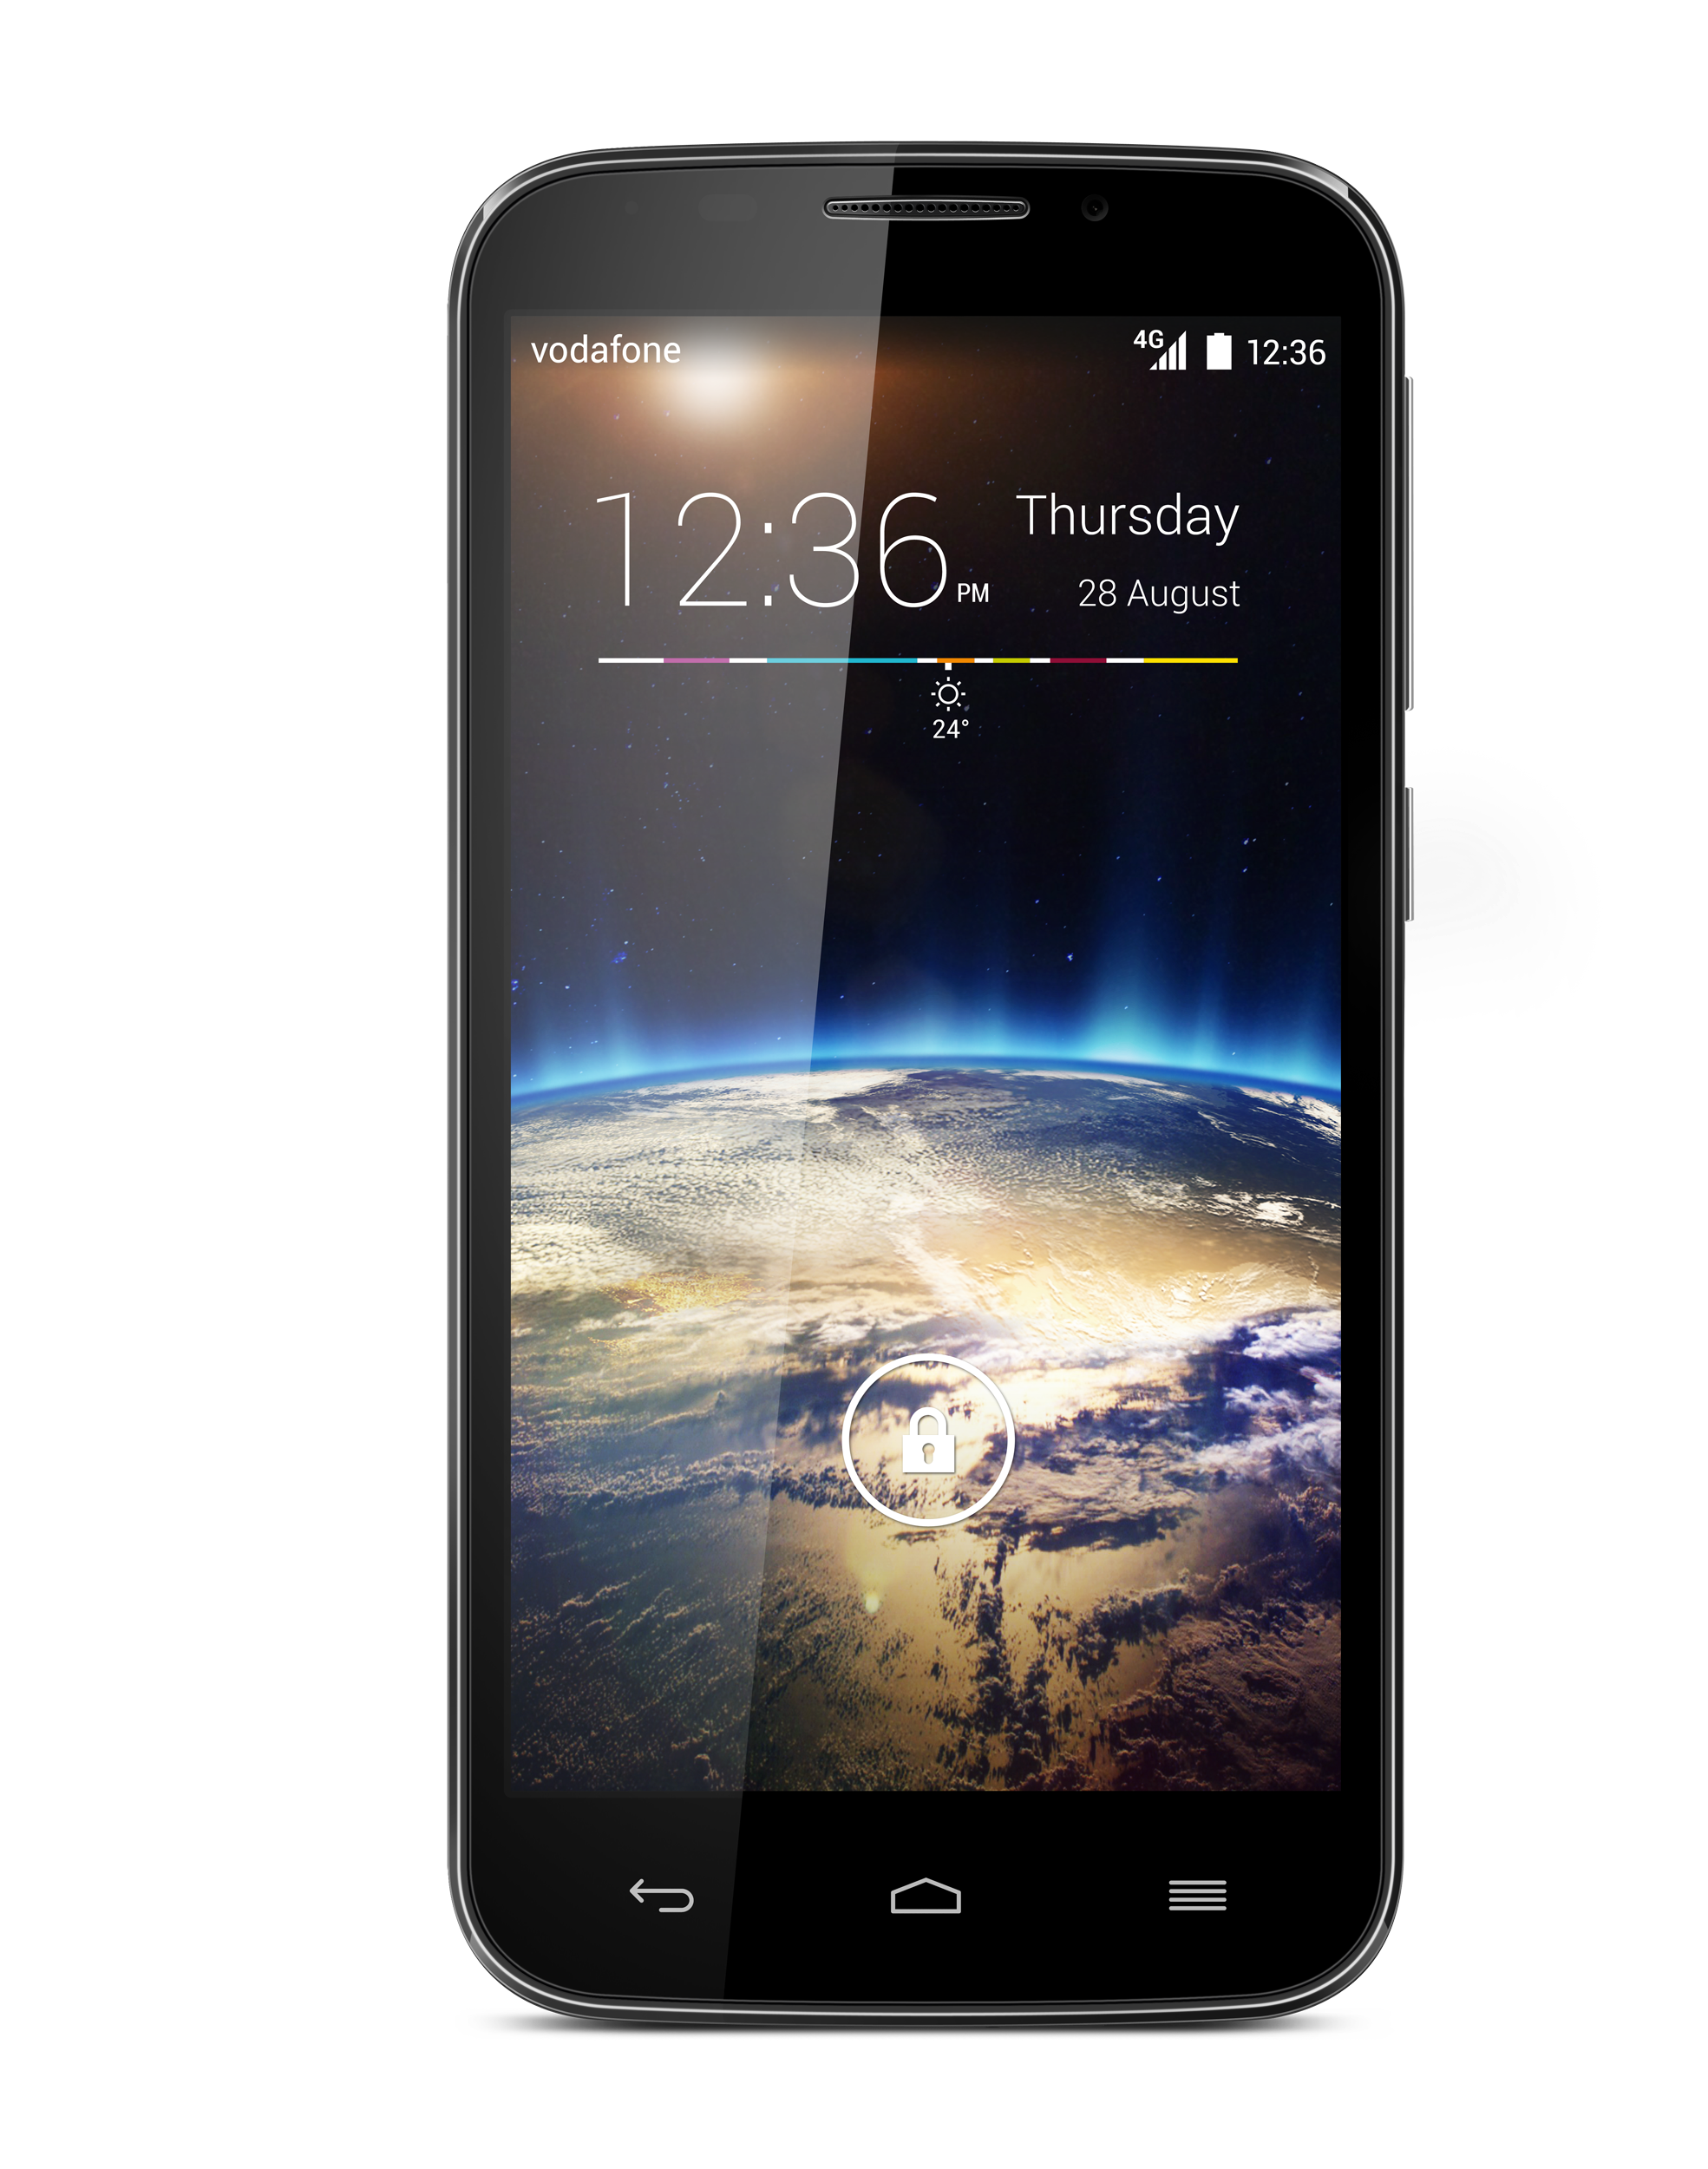 vodaphone smartphone 4 power sweepstakes